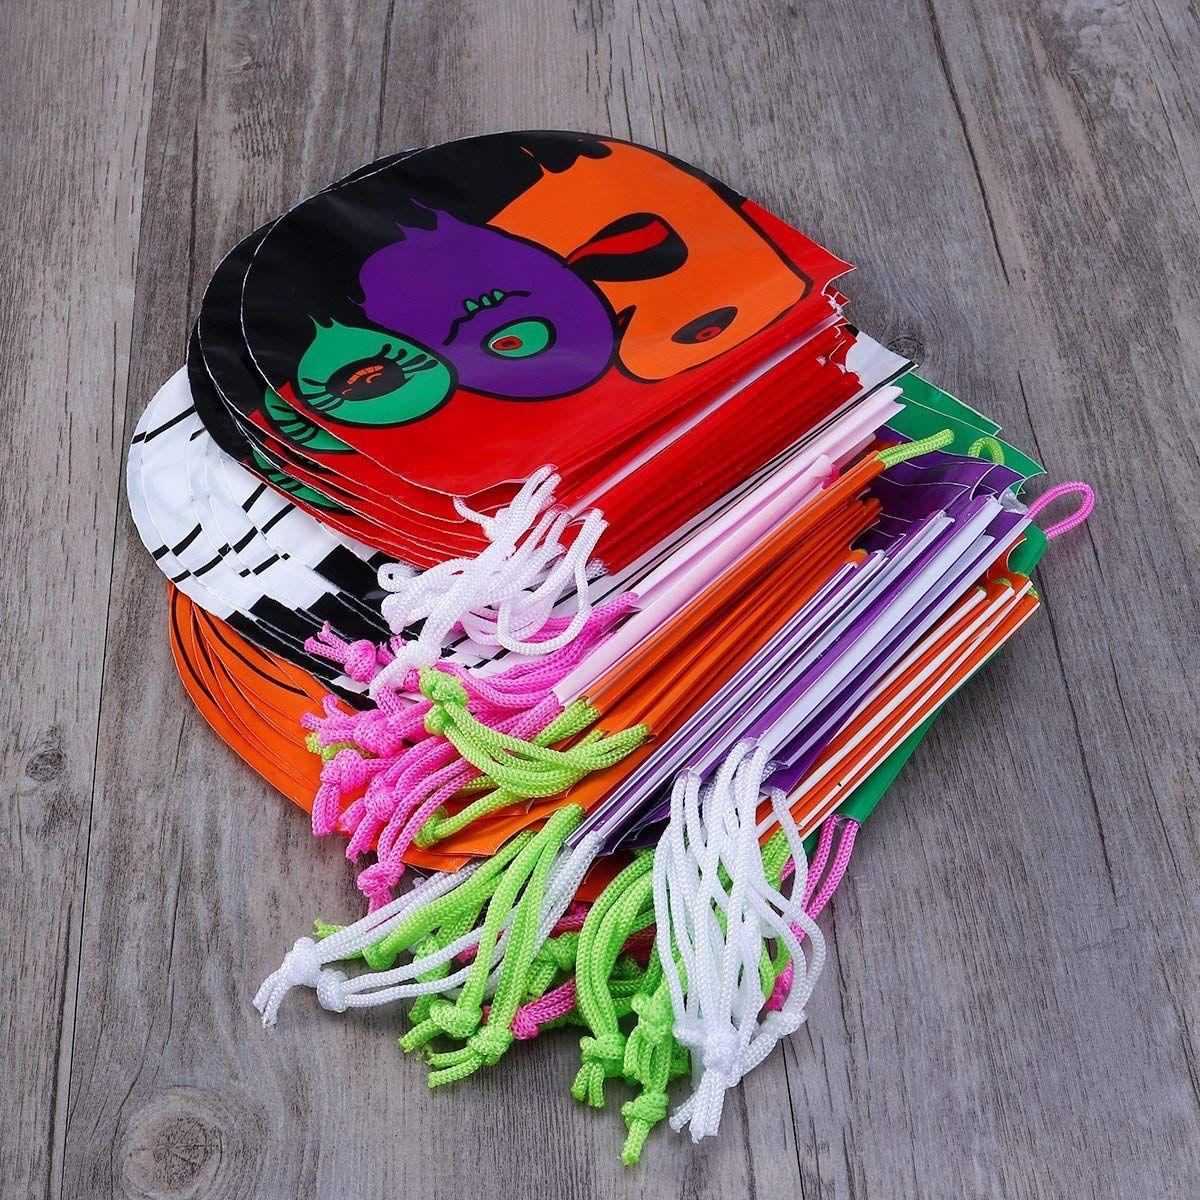 Unomor Halloween Candy Bags Drawstring